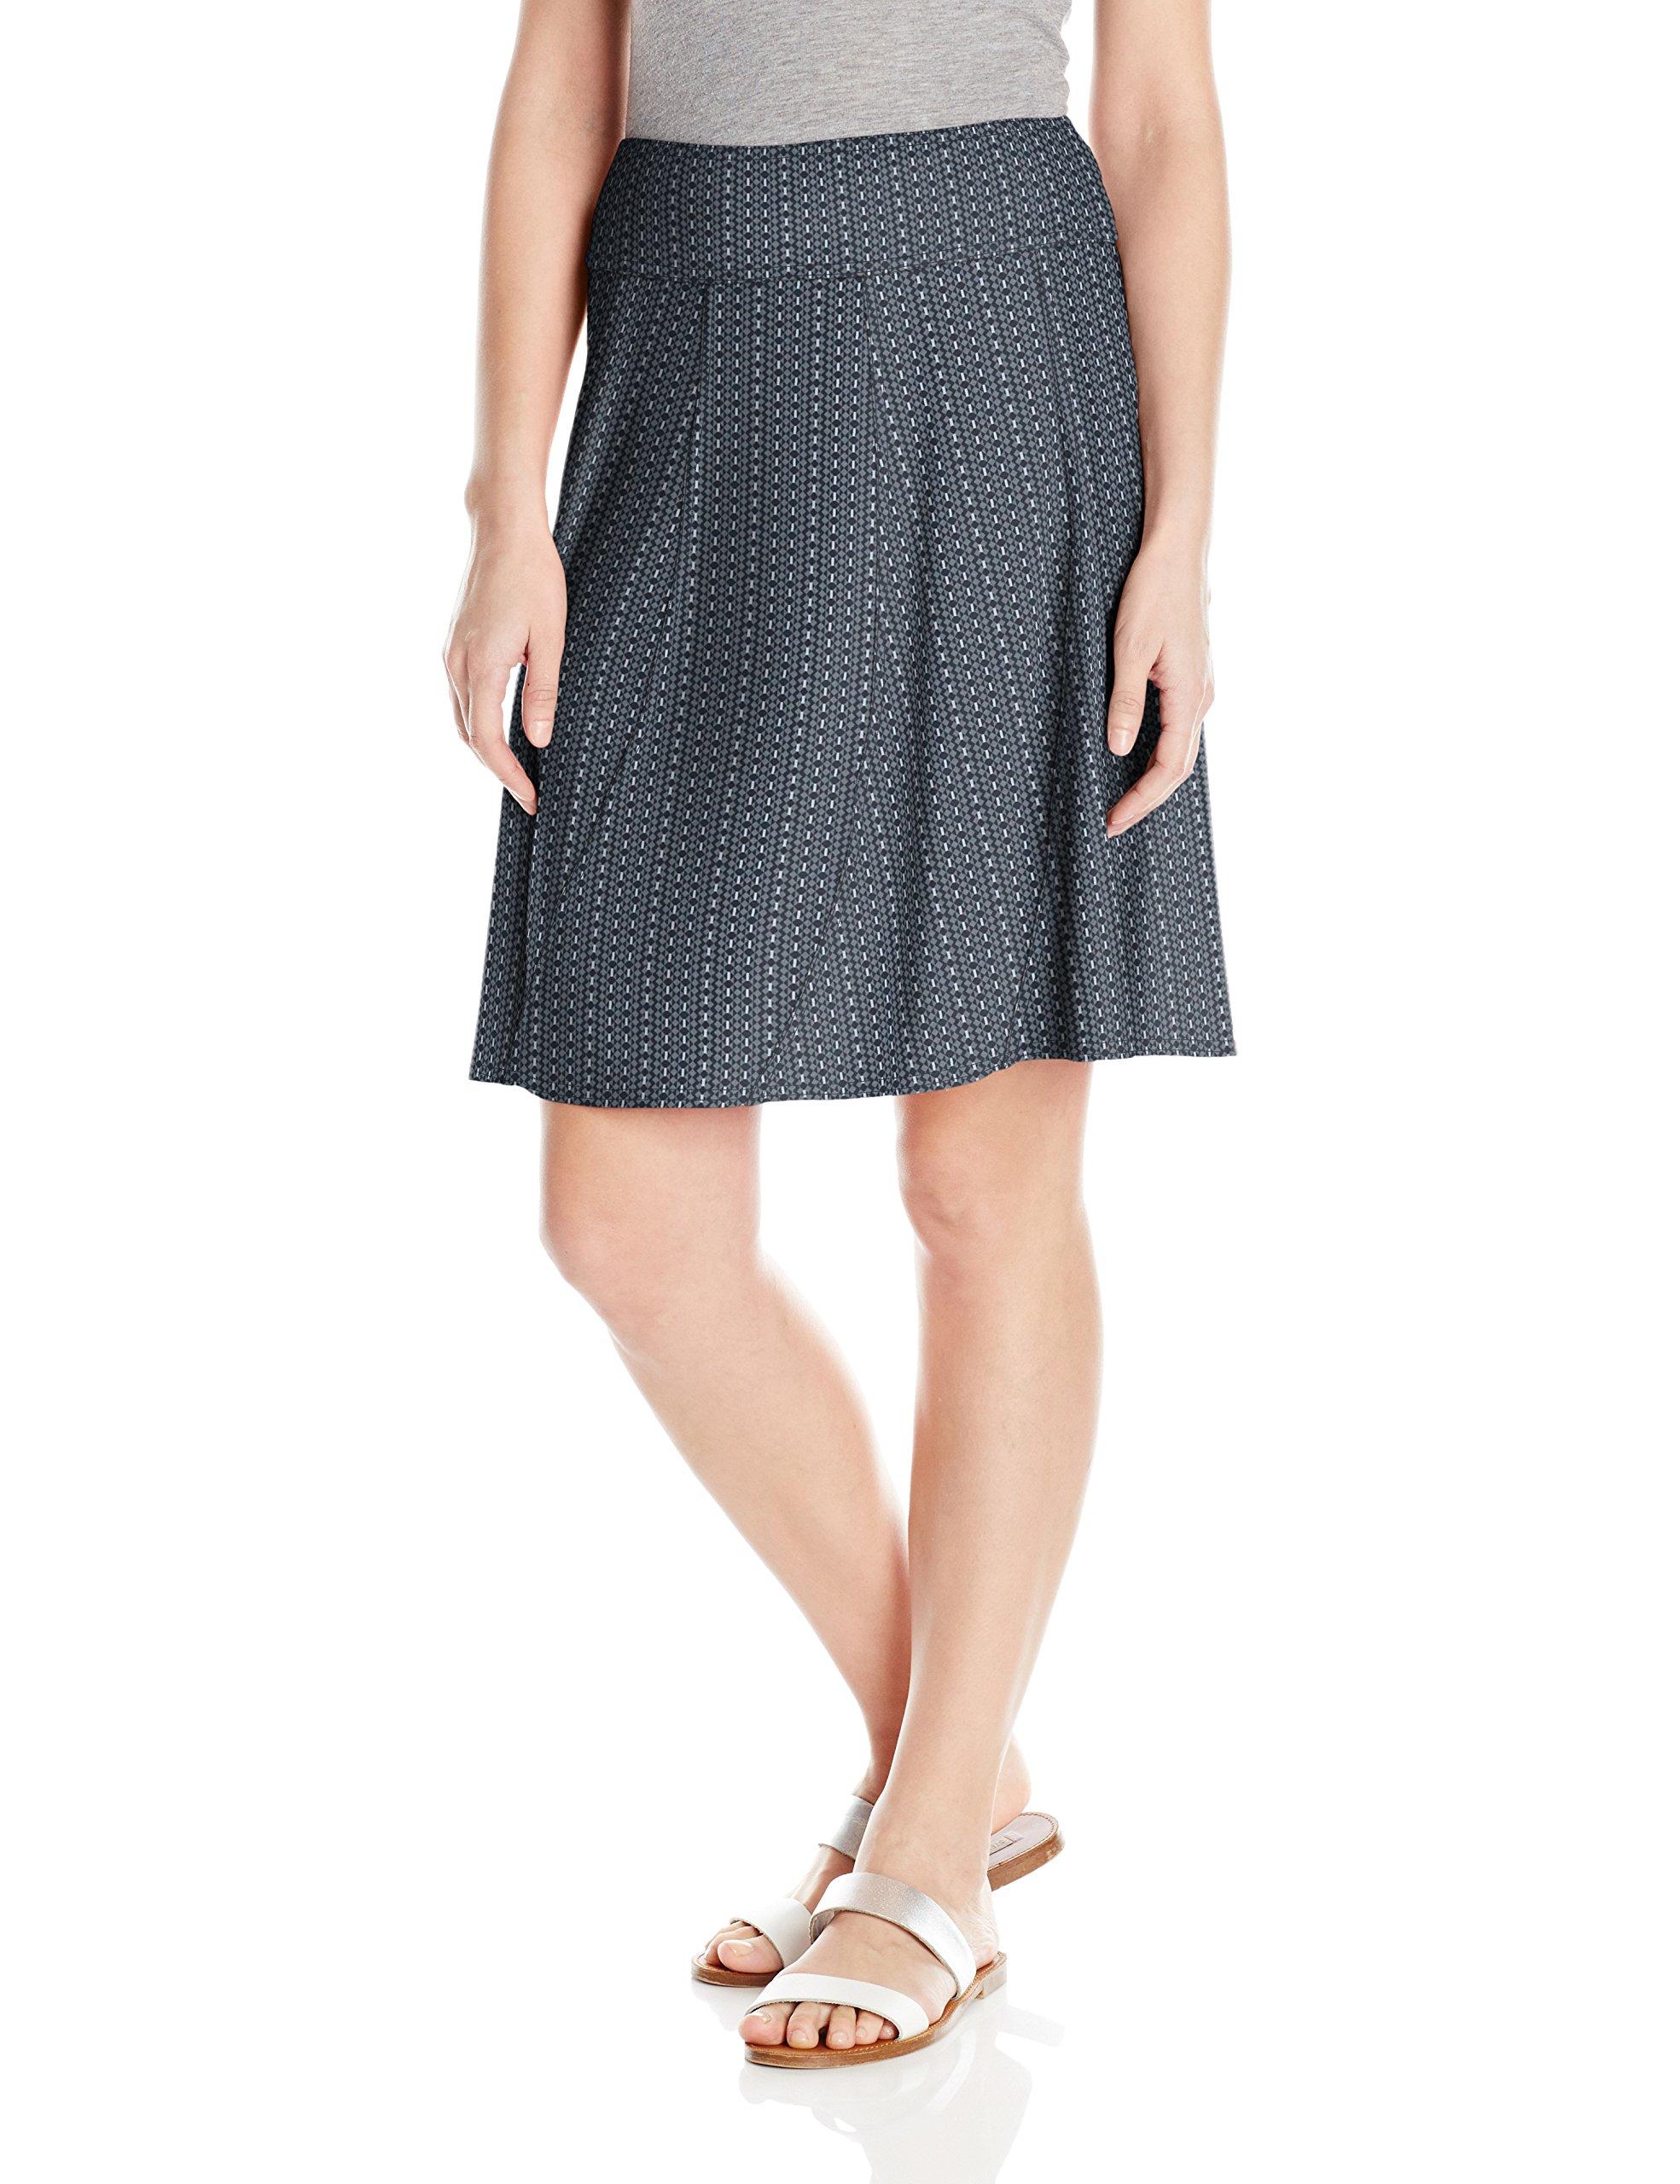 prAna Women's Vendela Printed Skirt, Charcoal Parade, Medium